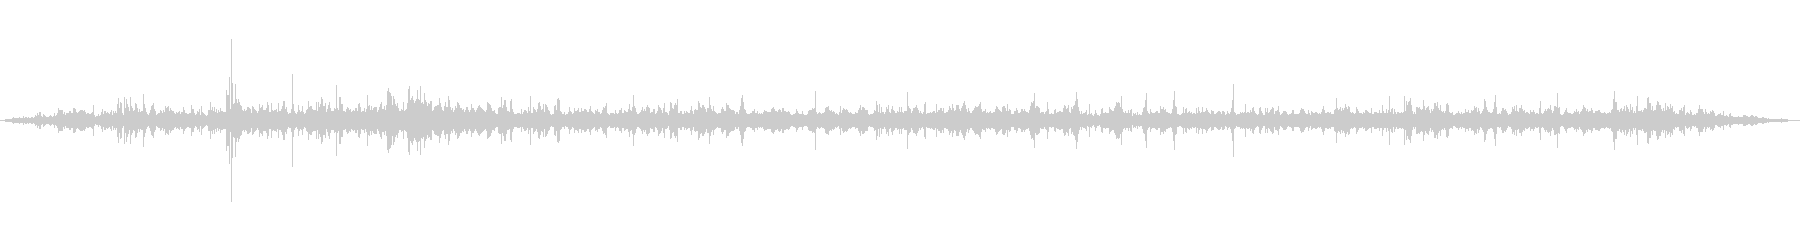 [ASMR]波打ち際の音_008の未再生の波形